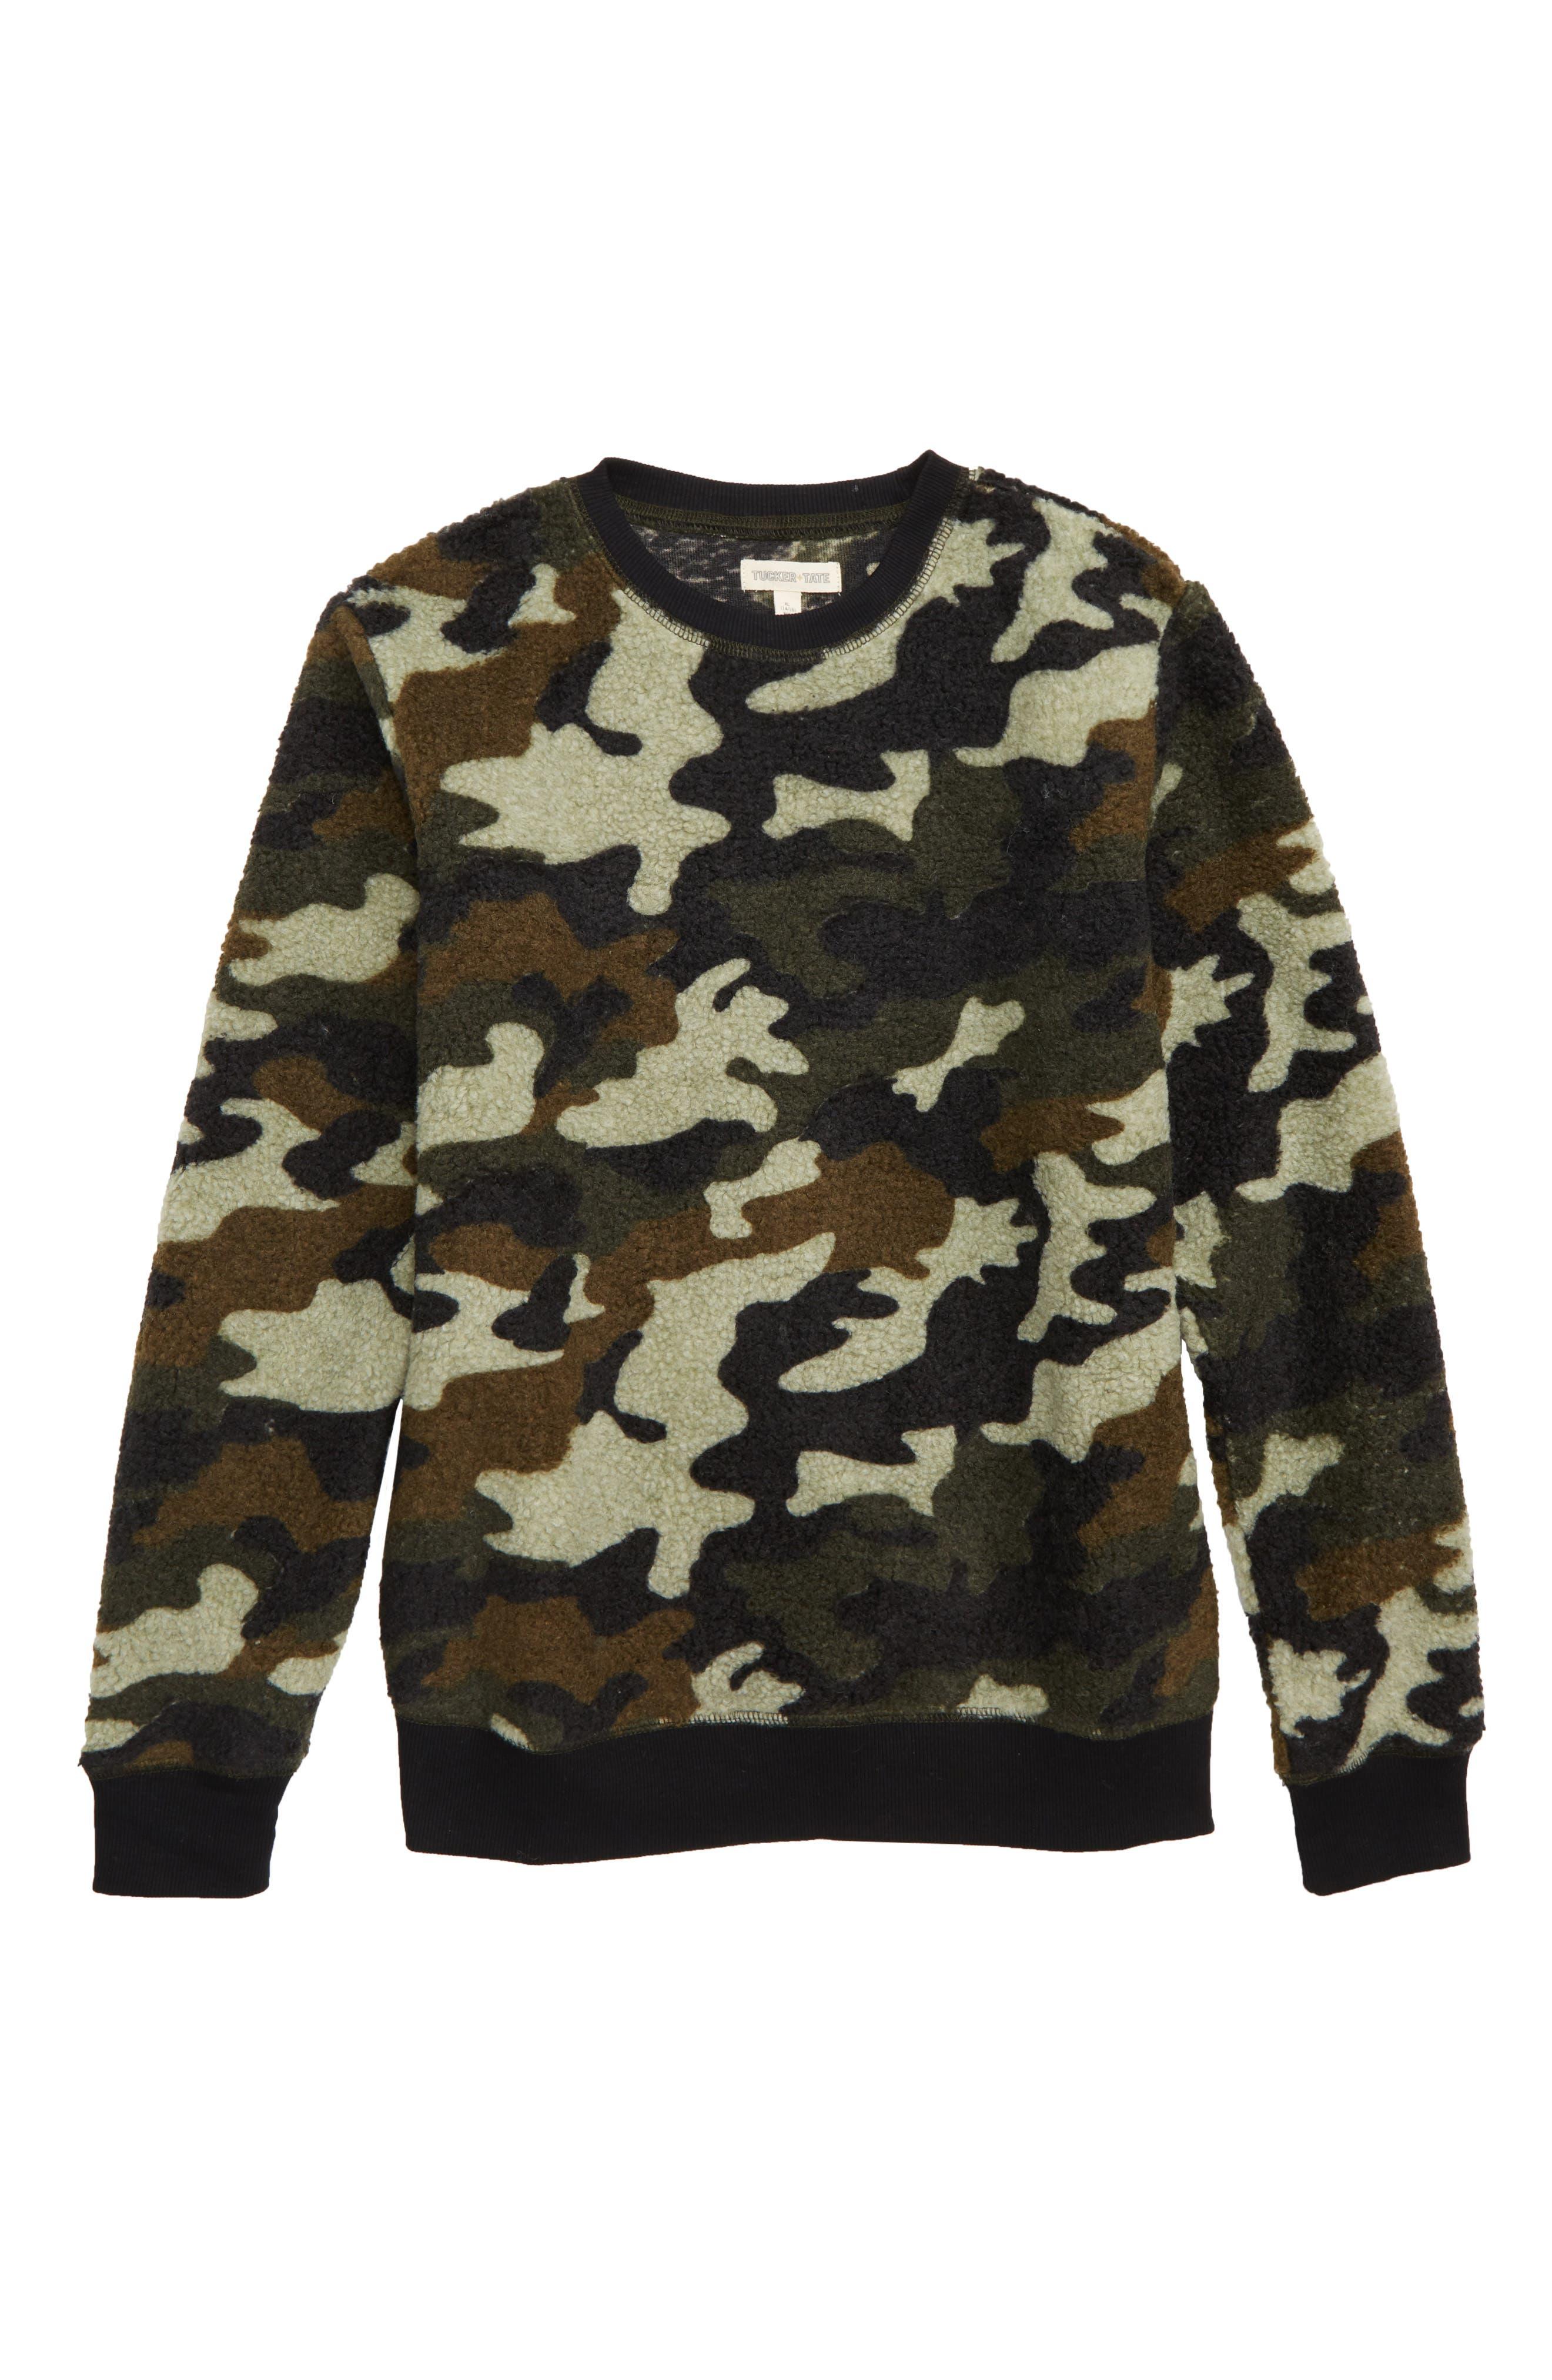 Fleece Camo Crewneck Sweatshirt,                         Main,                         color, OLIVE SARMA CAMOUFLAGE